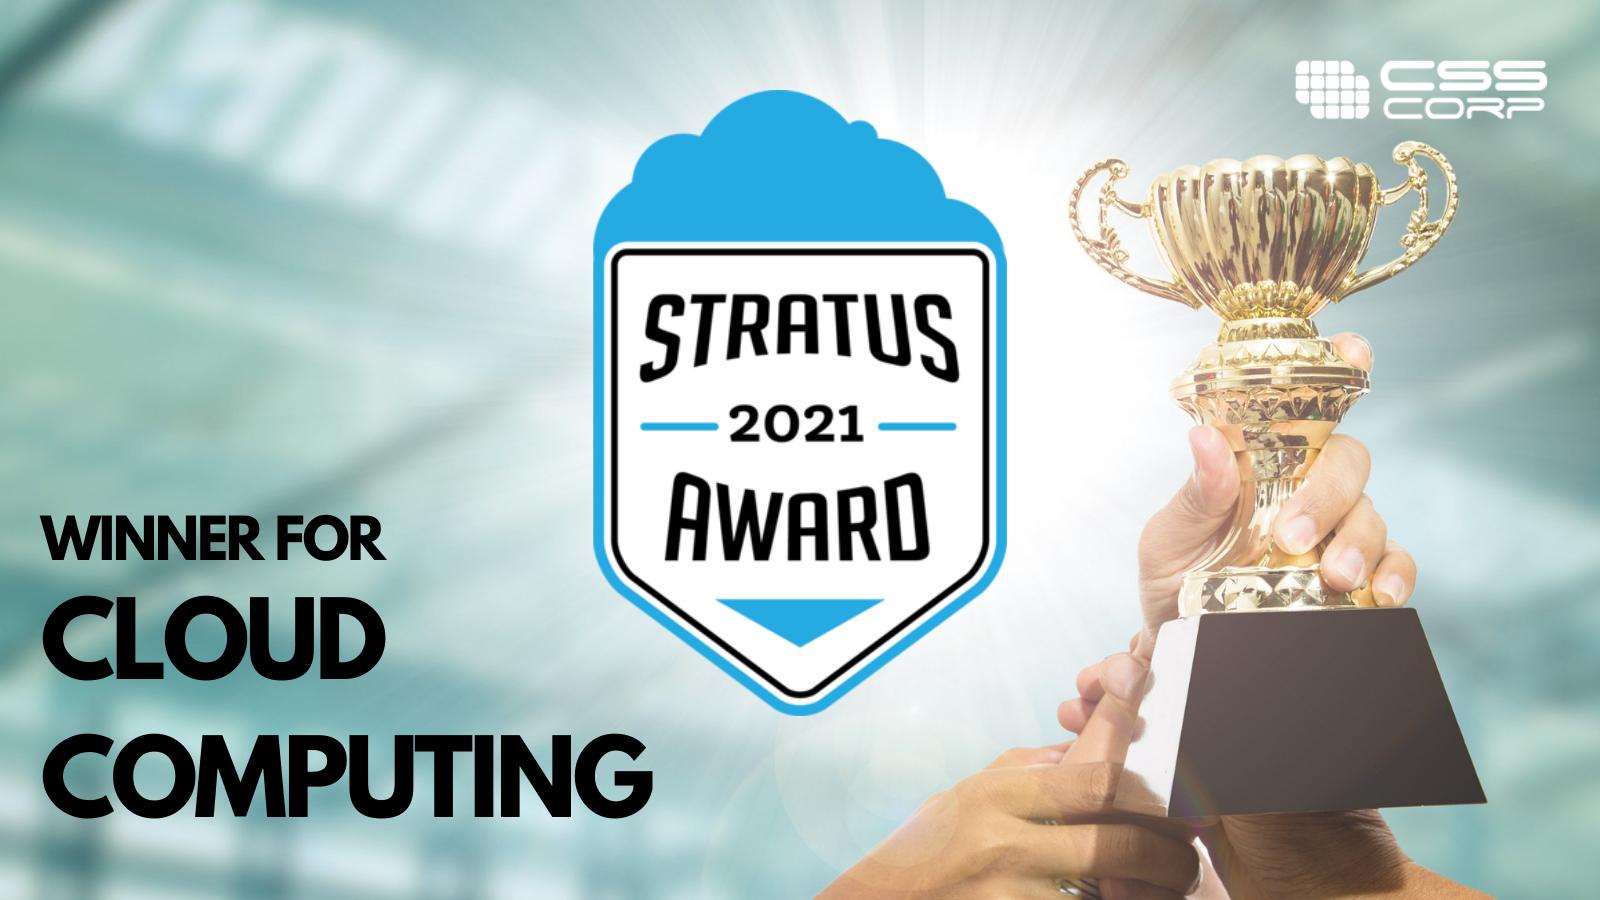 ROI Assured By Award-Winning Cloud Platform—CSS CONTELLI™